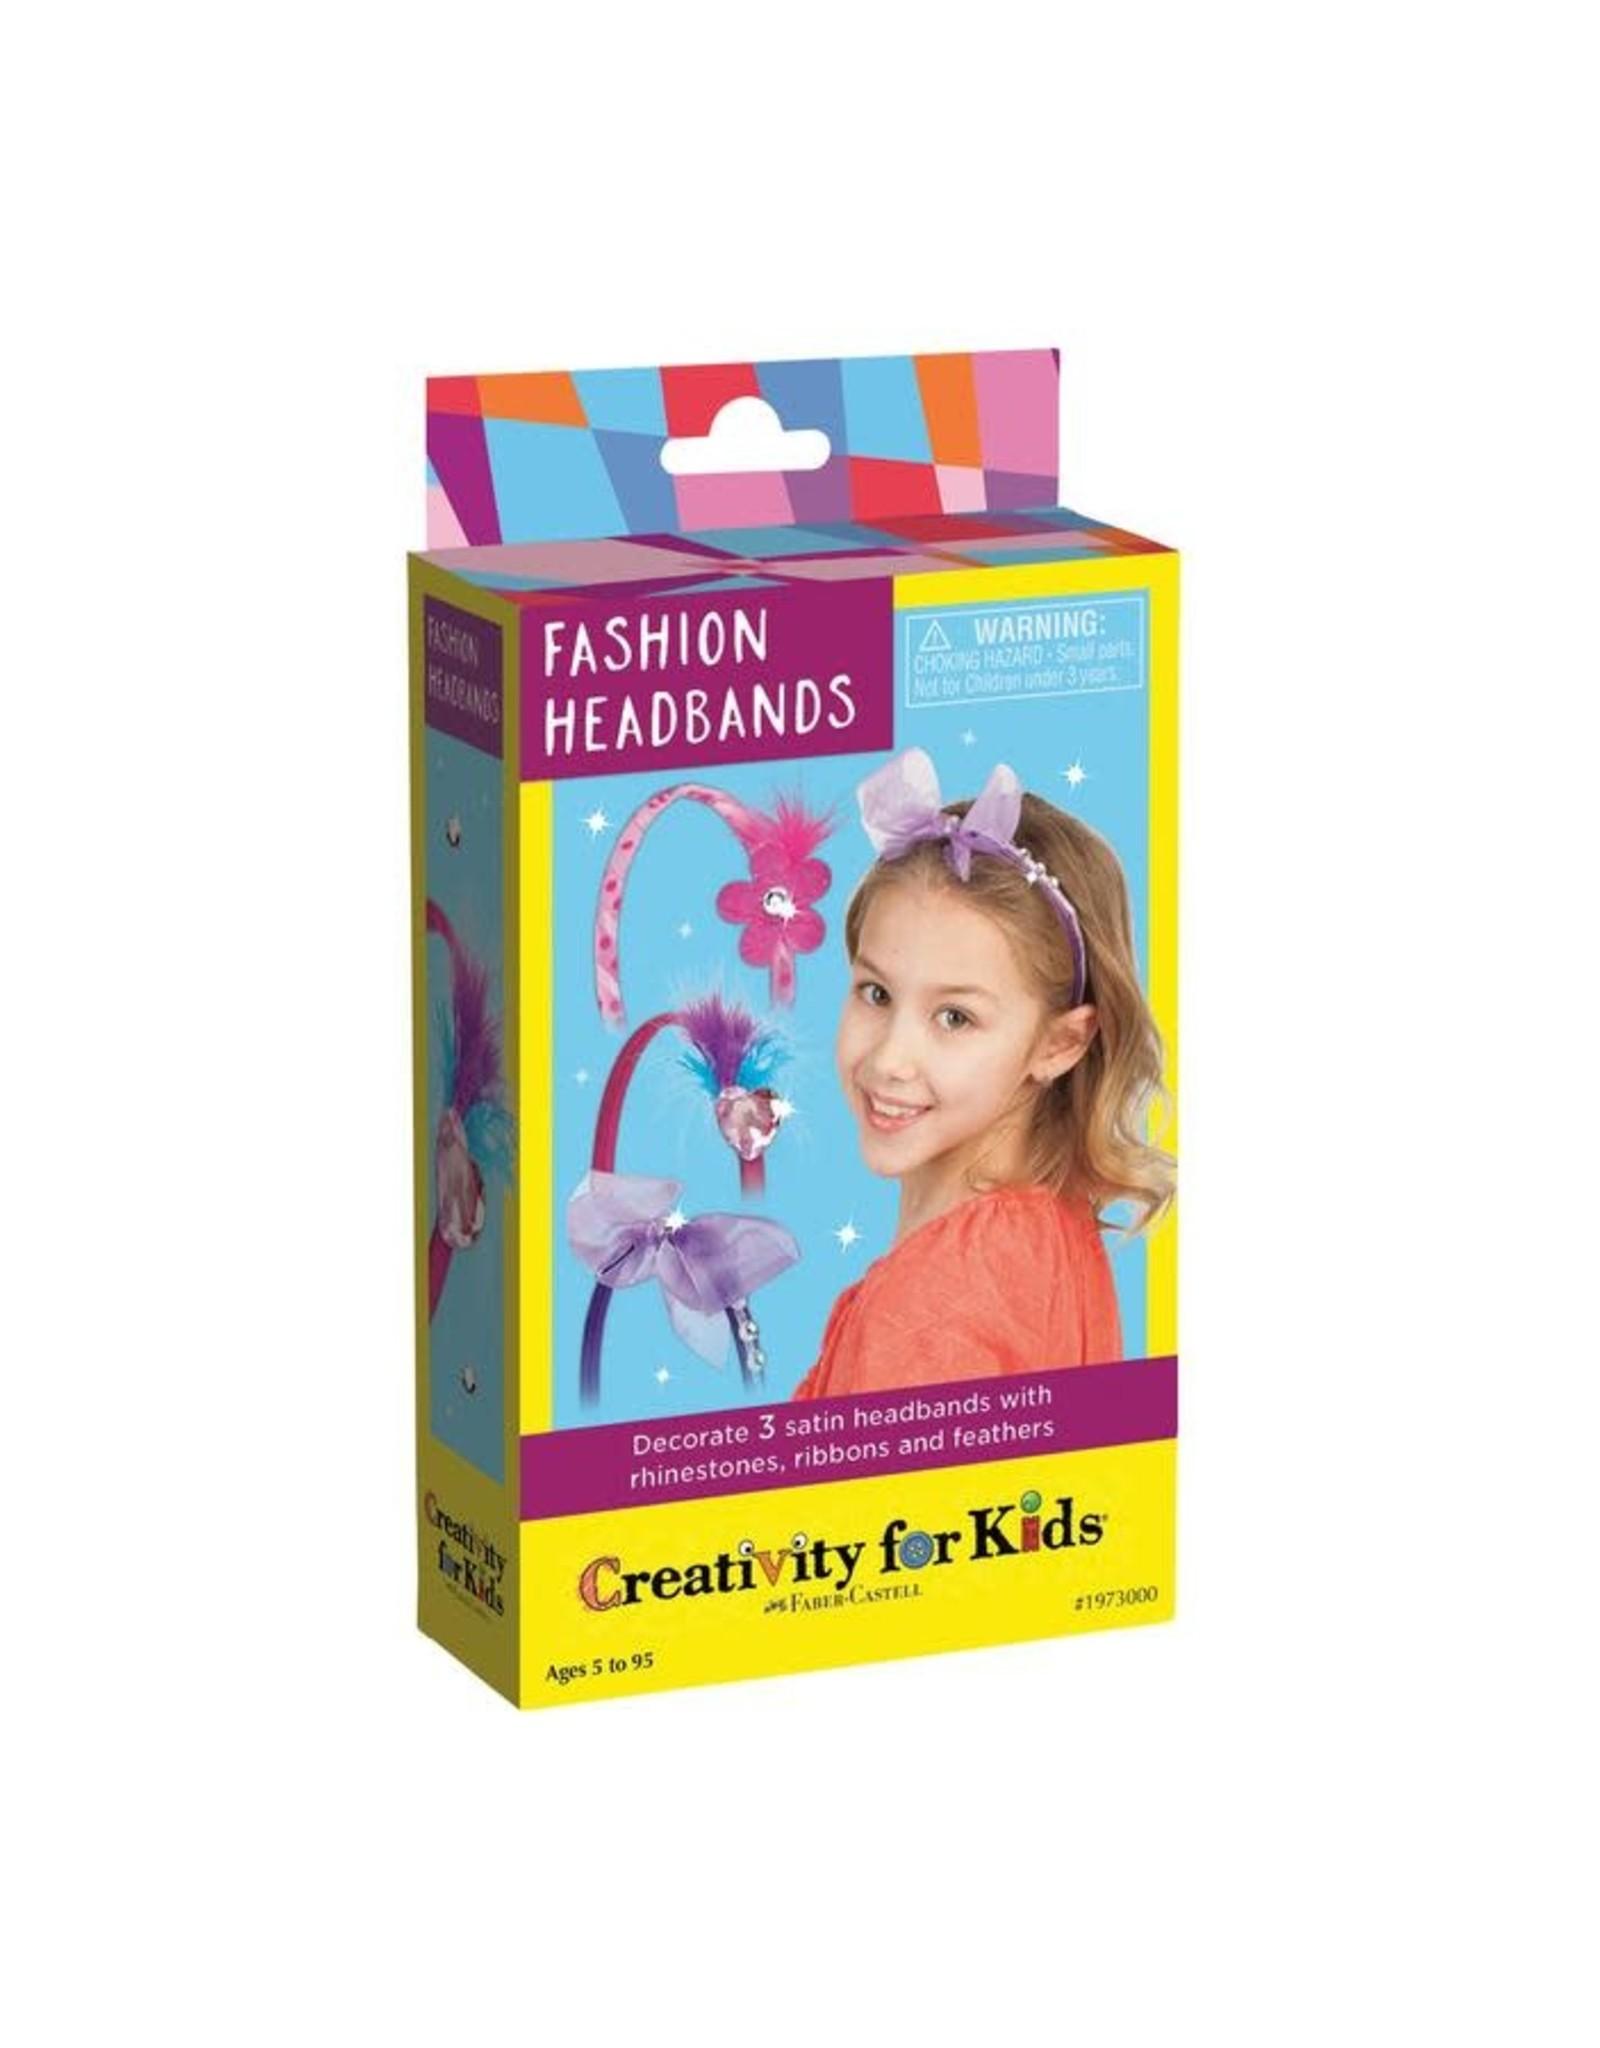 Creativity For Kids Fashion Headbands Mini Kit